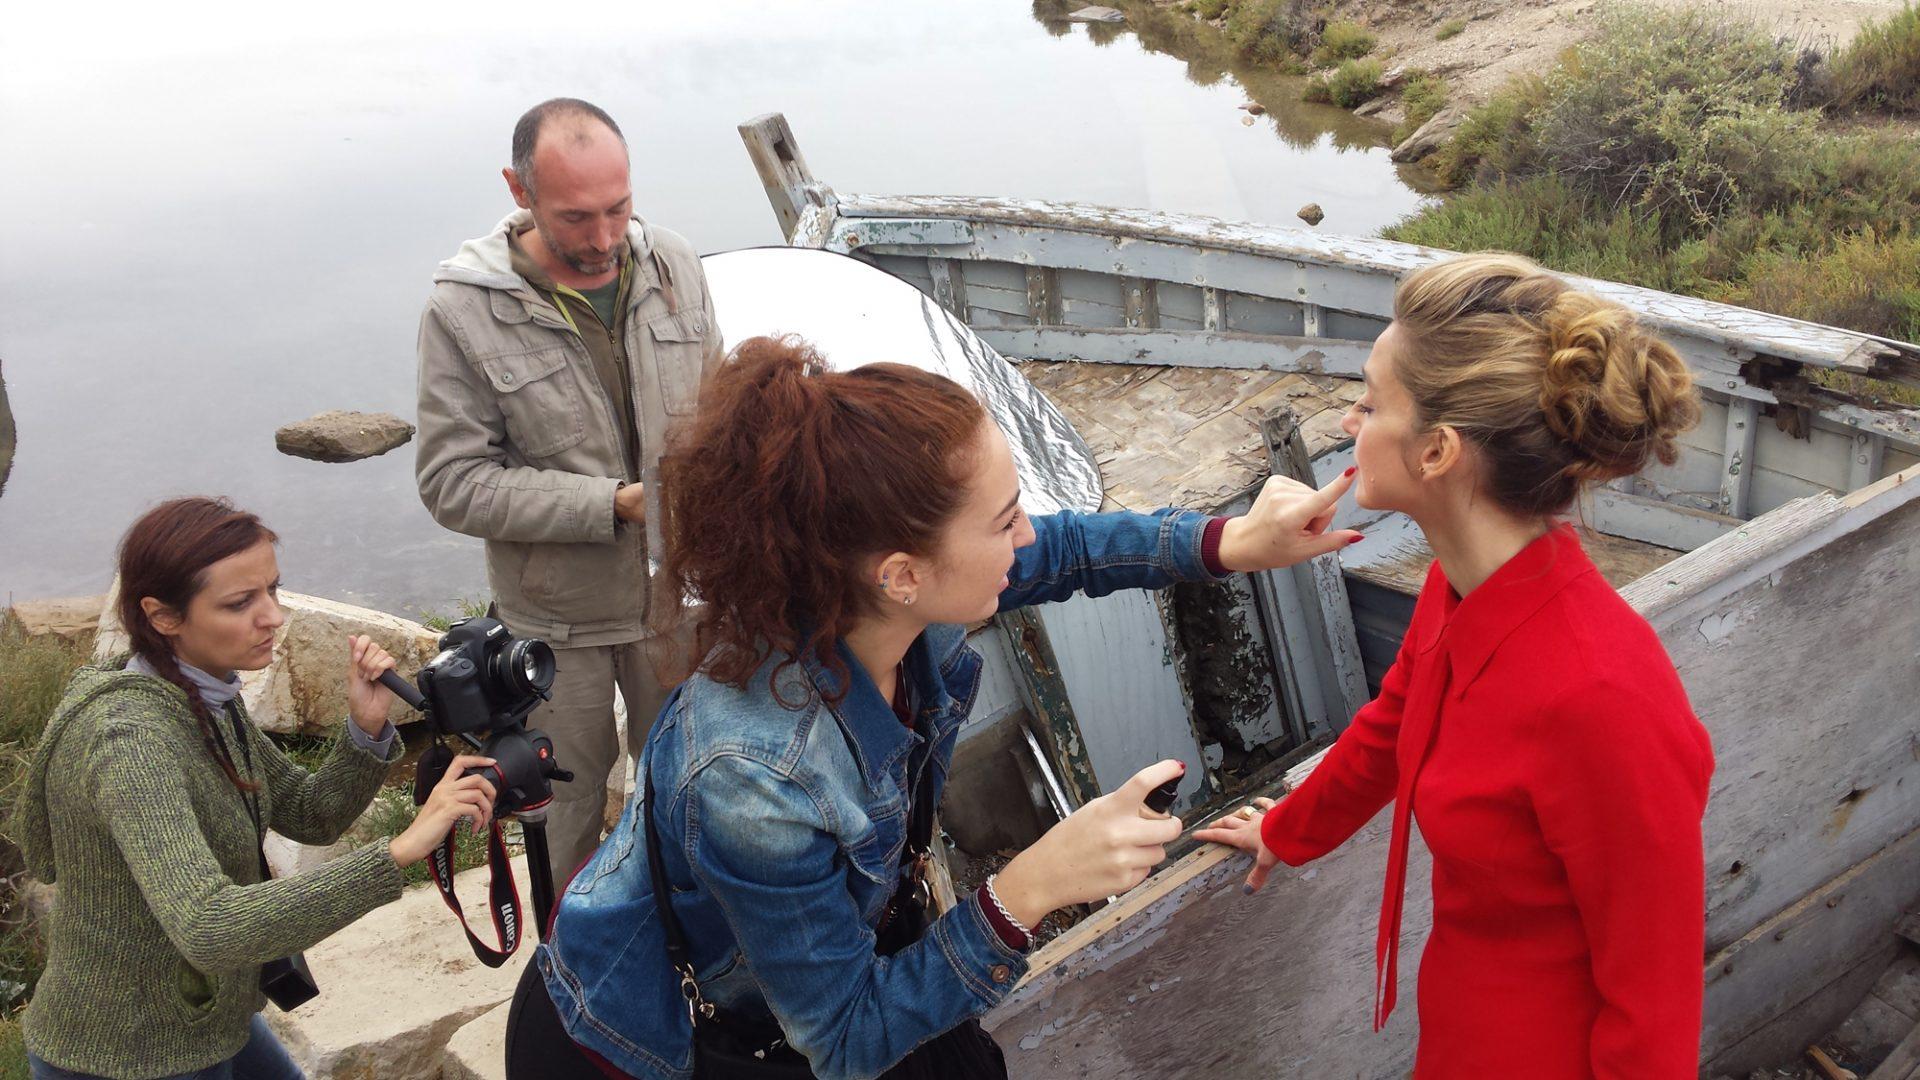 making-of-tournage-clip-photographe-paca-var